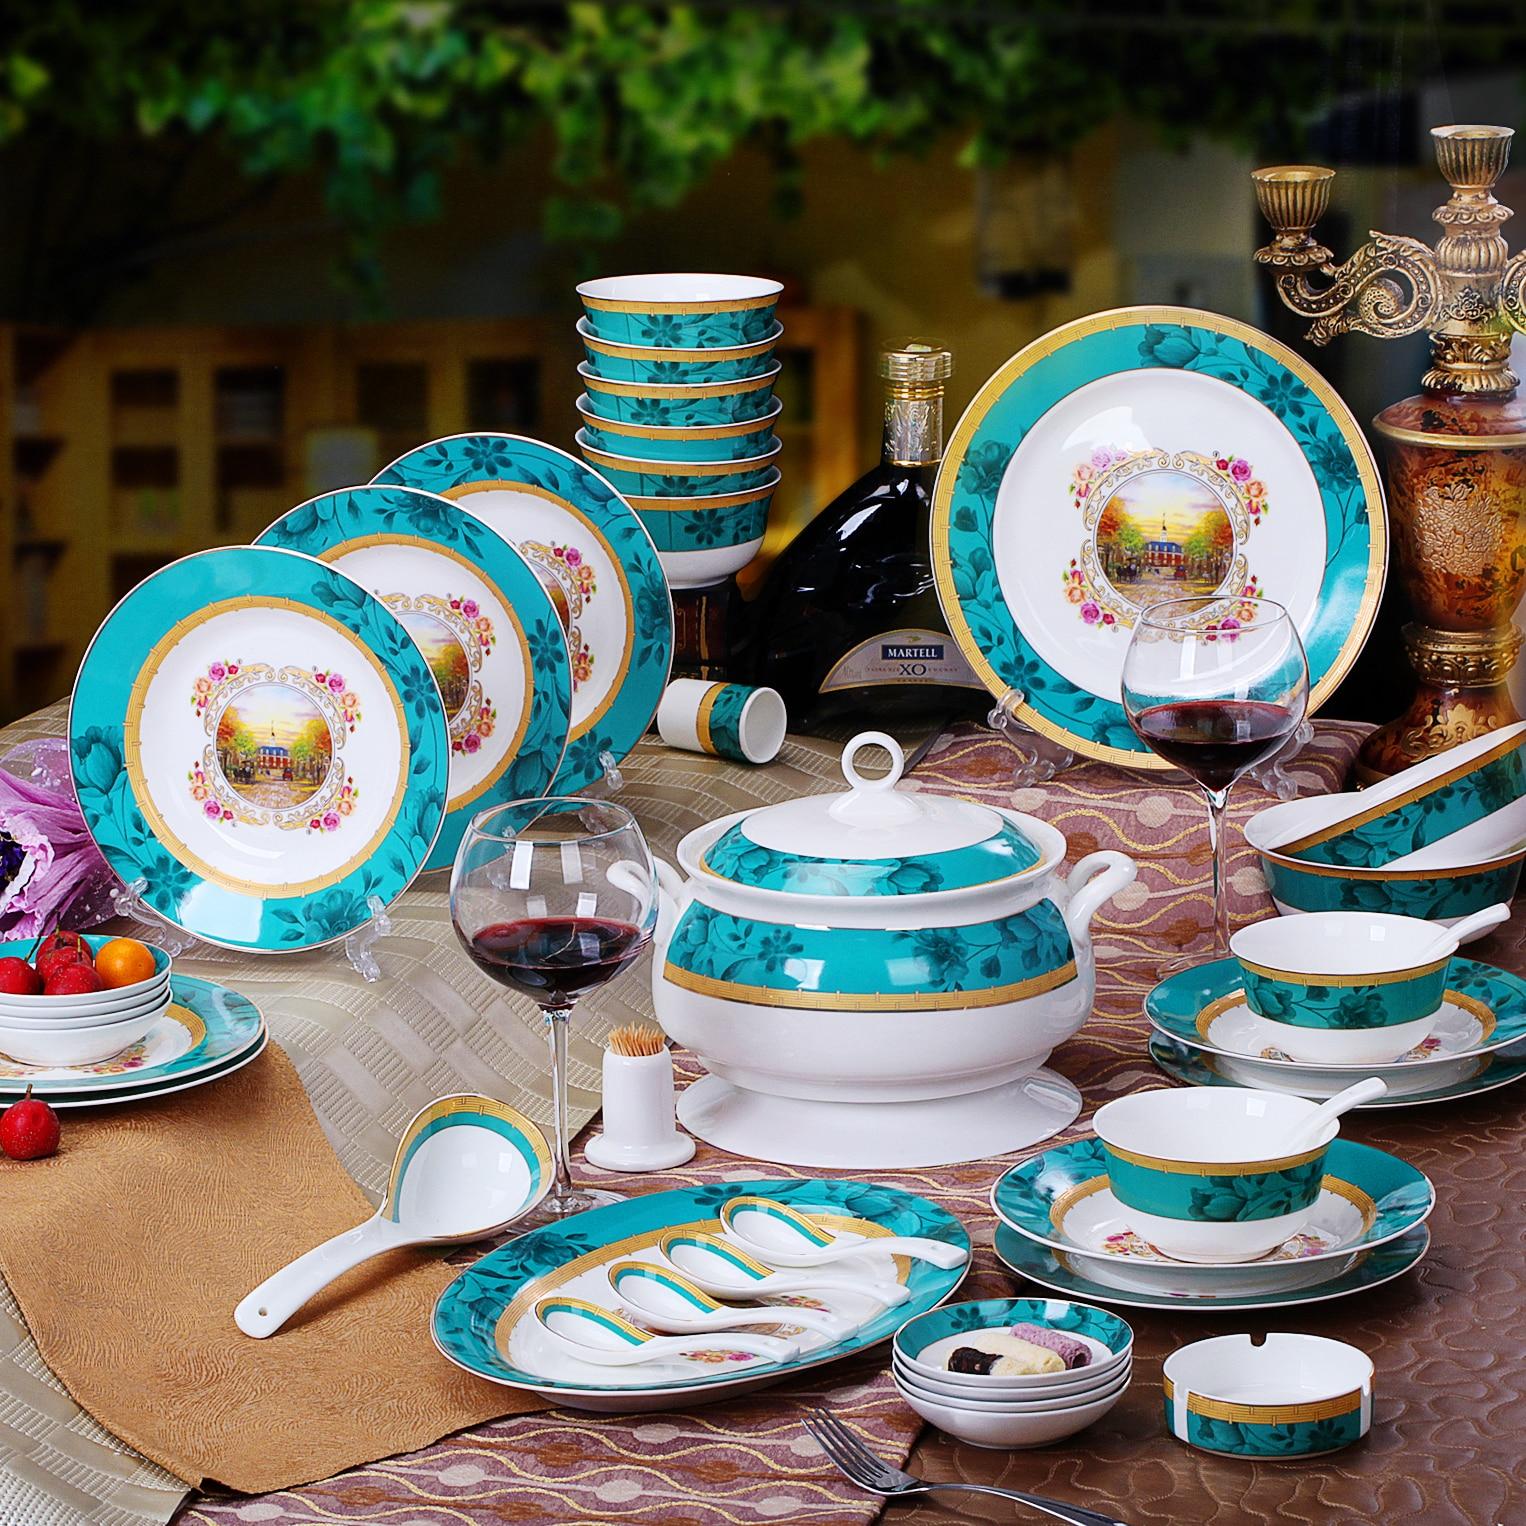 Wedding Gift China: Free Shipping Jingdezhen Ceramic Bone China Bowl Plate